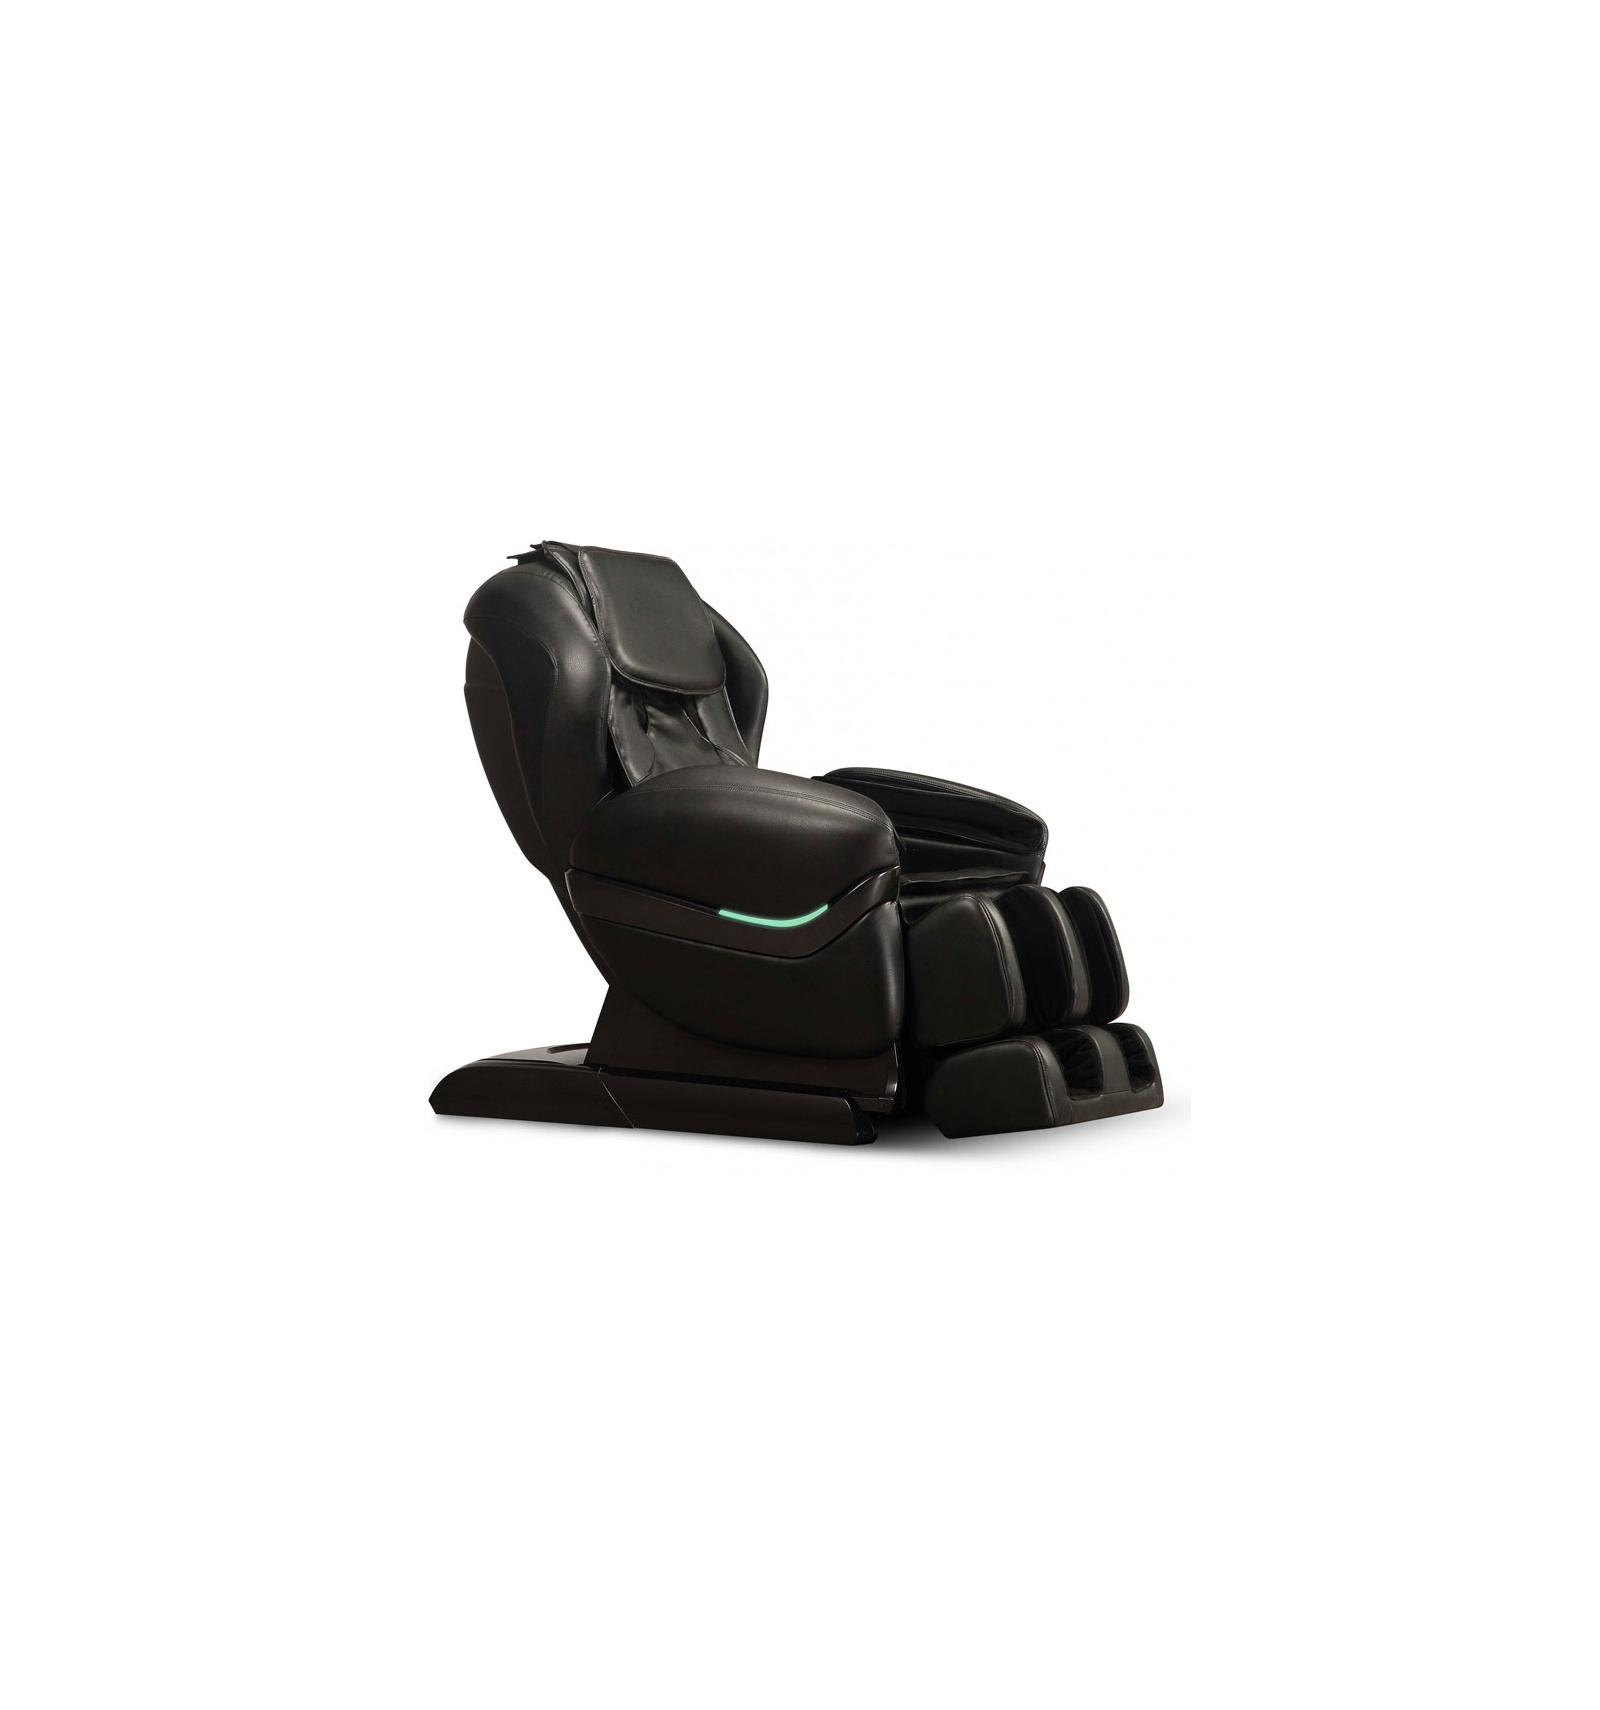 fauteuil de massage de luxe. Black Bedroom Furniture Sets. Home Design Ideas